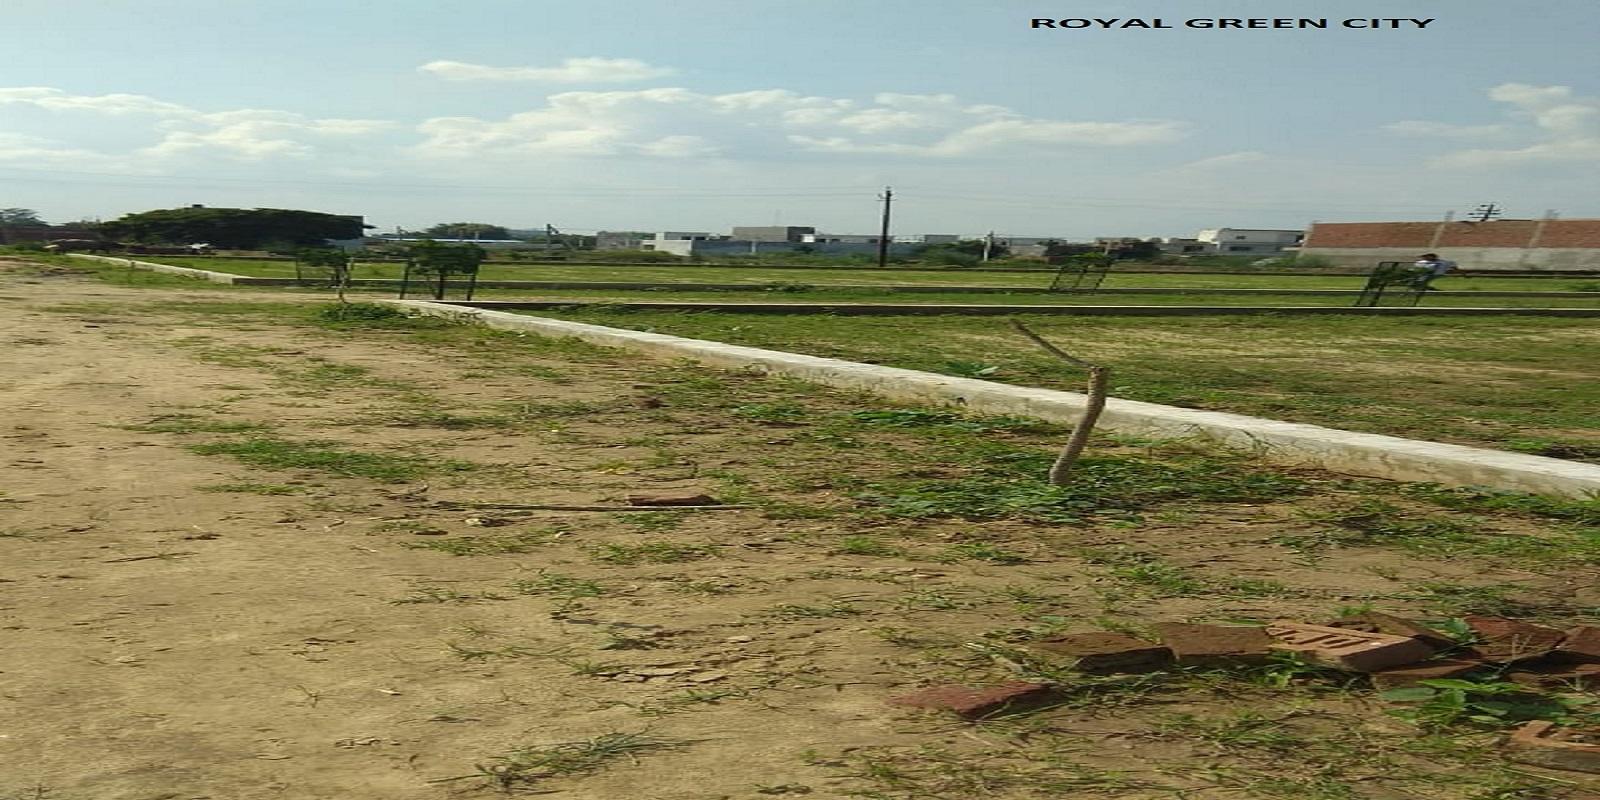 royal green city gomati nagar project project large image1